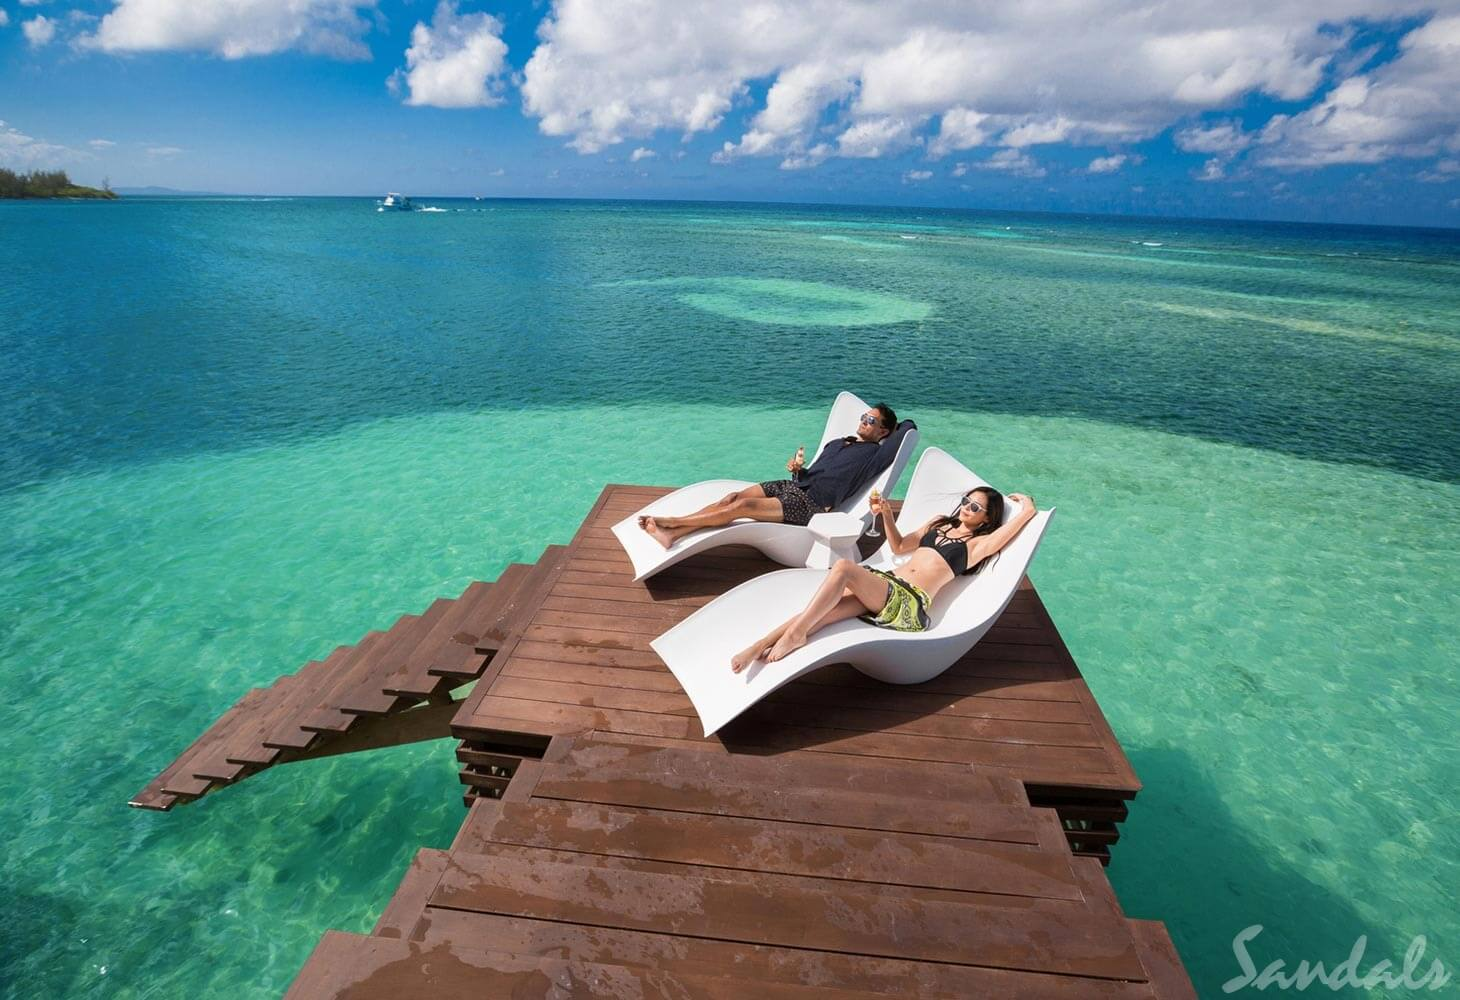 Sandals Royal Caribbean Overwater Deck